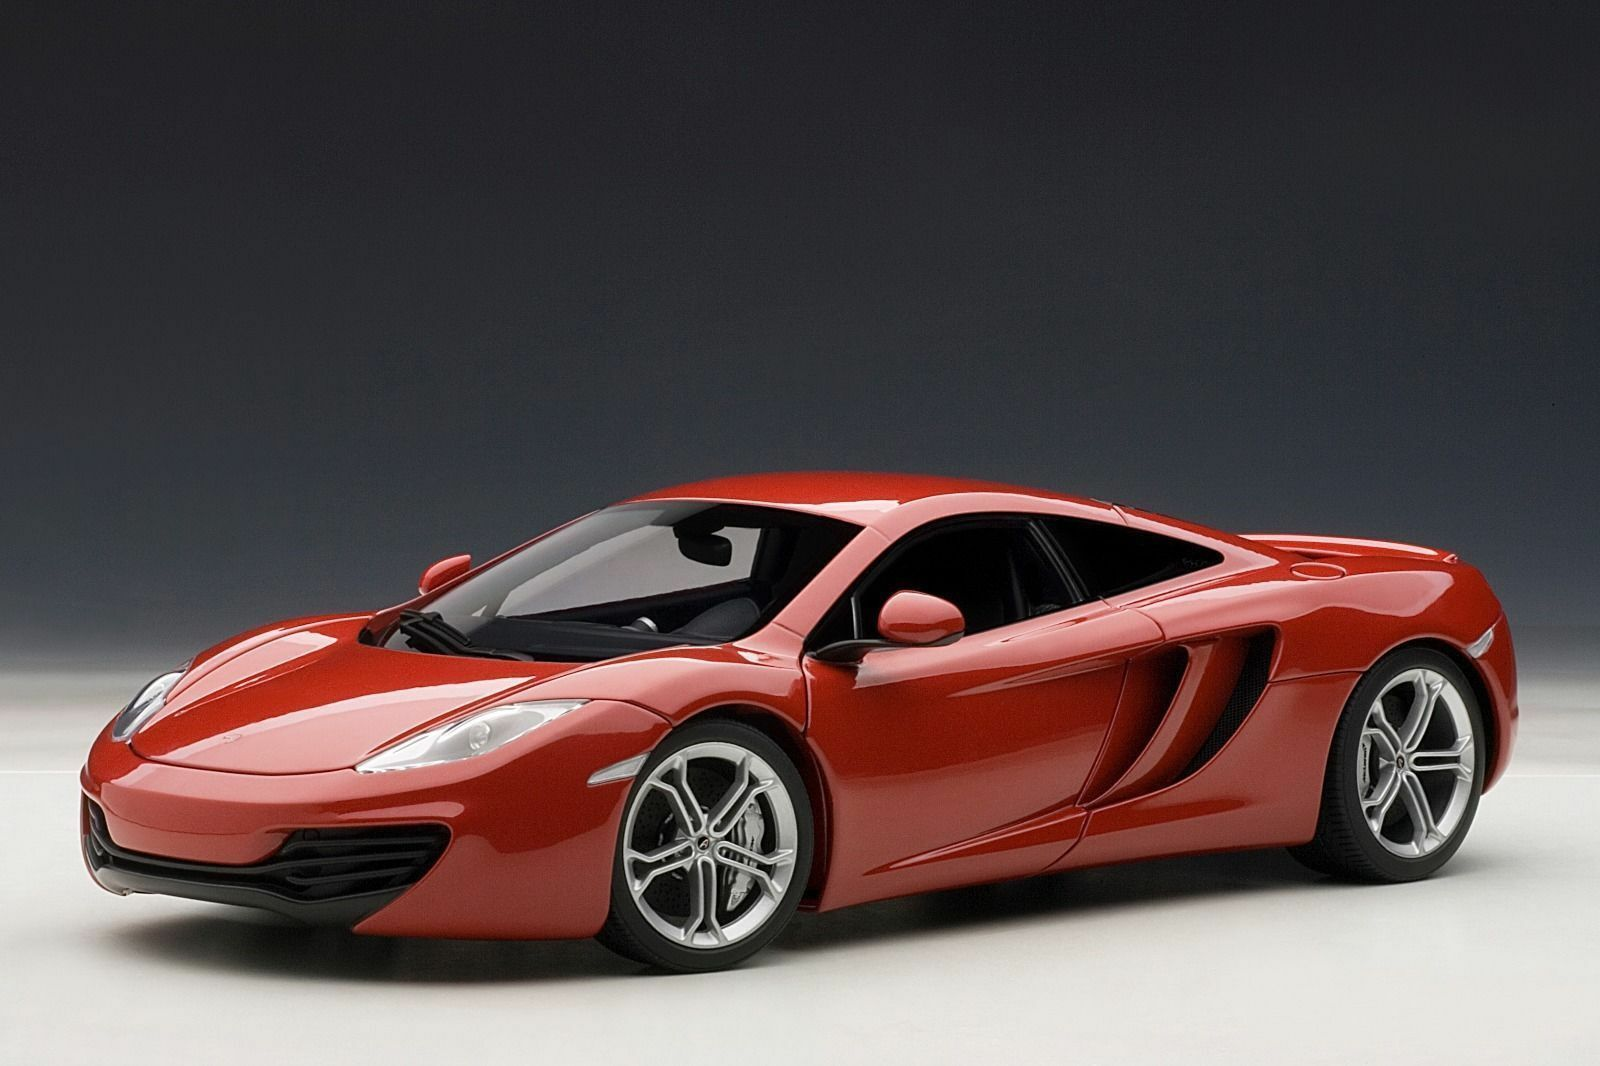 1 18 Autoart mclaren mp4-12c metalizado rosso